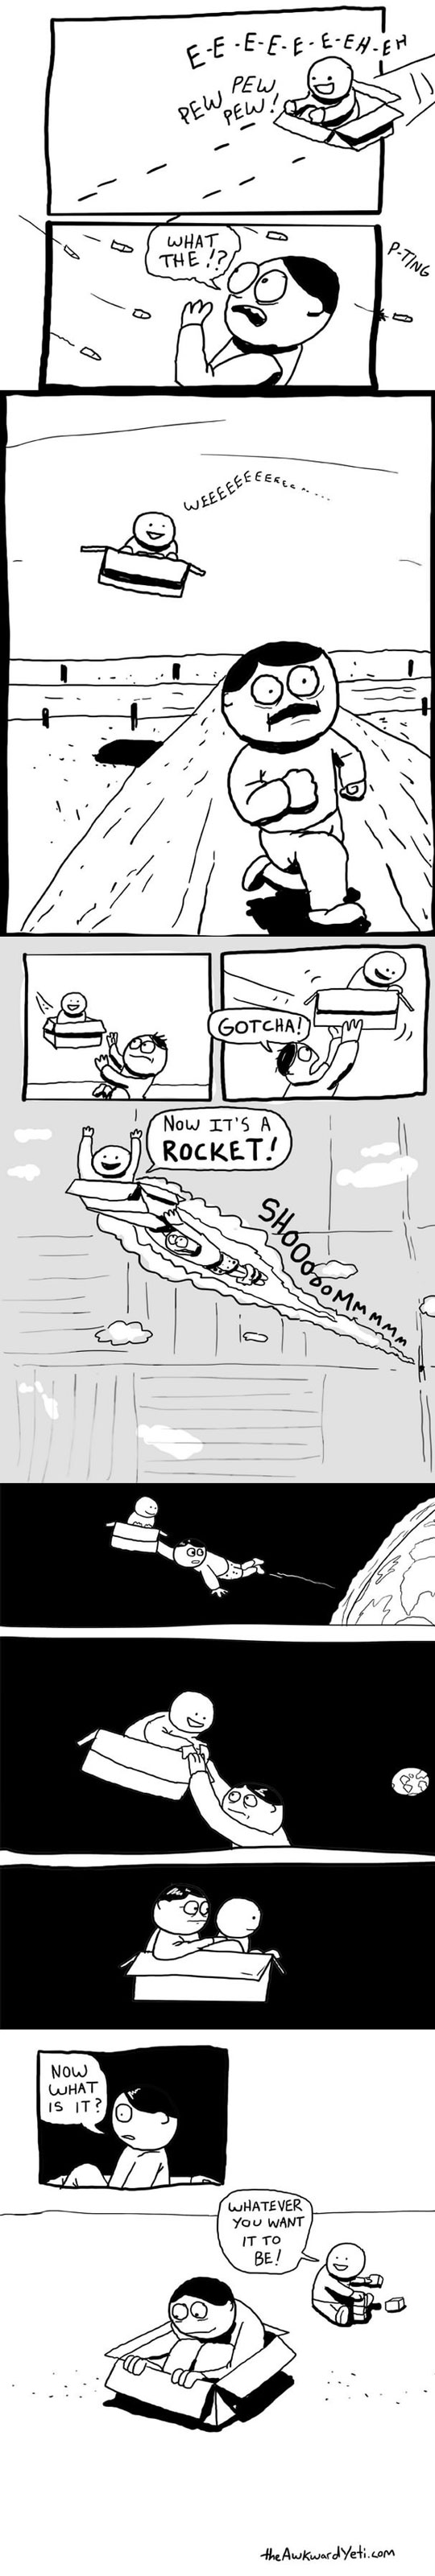 cool-webcomic-childhood-box-imagination-playing